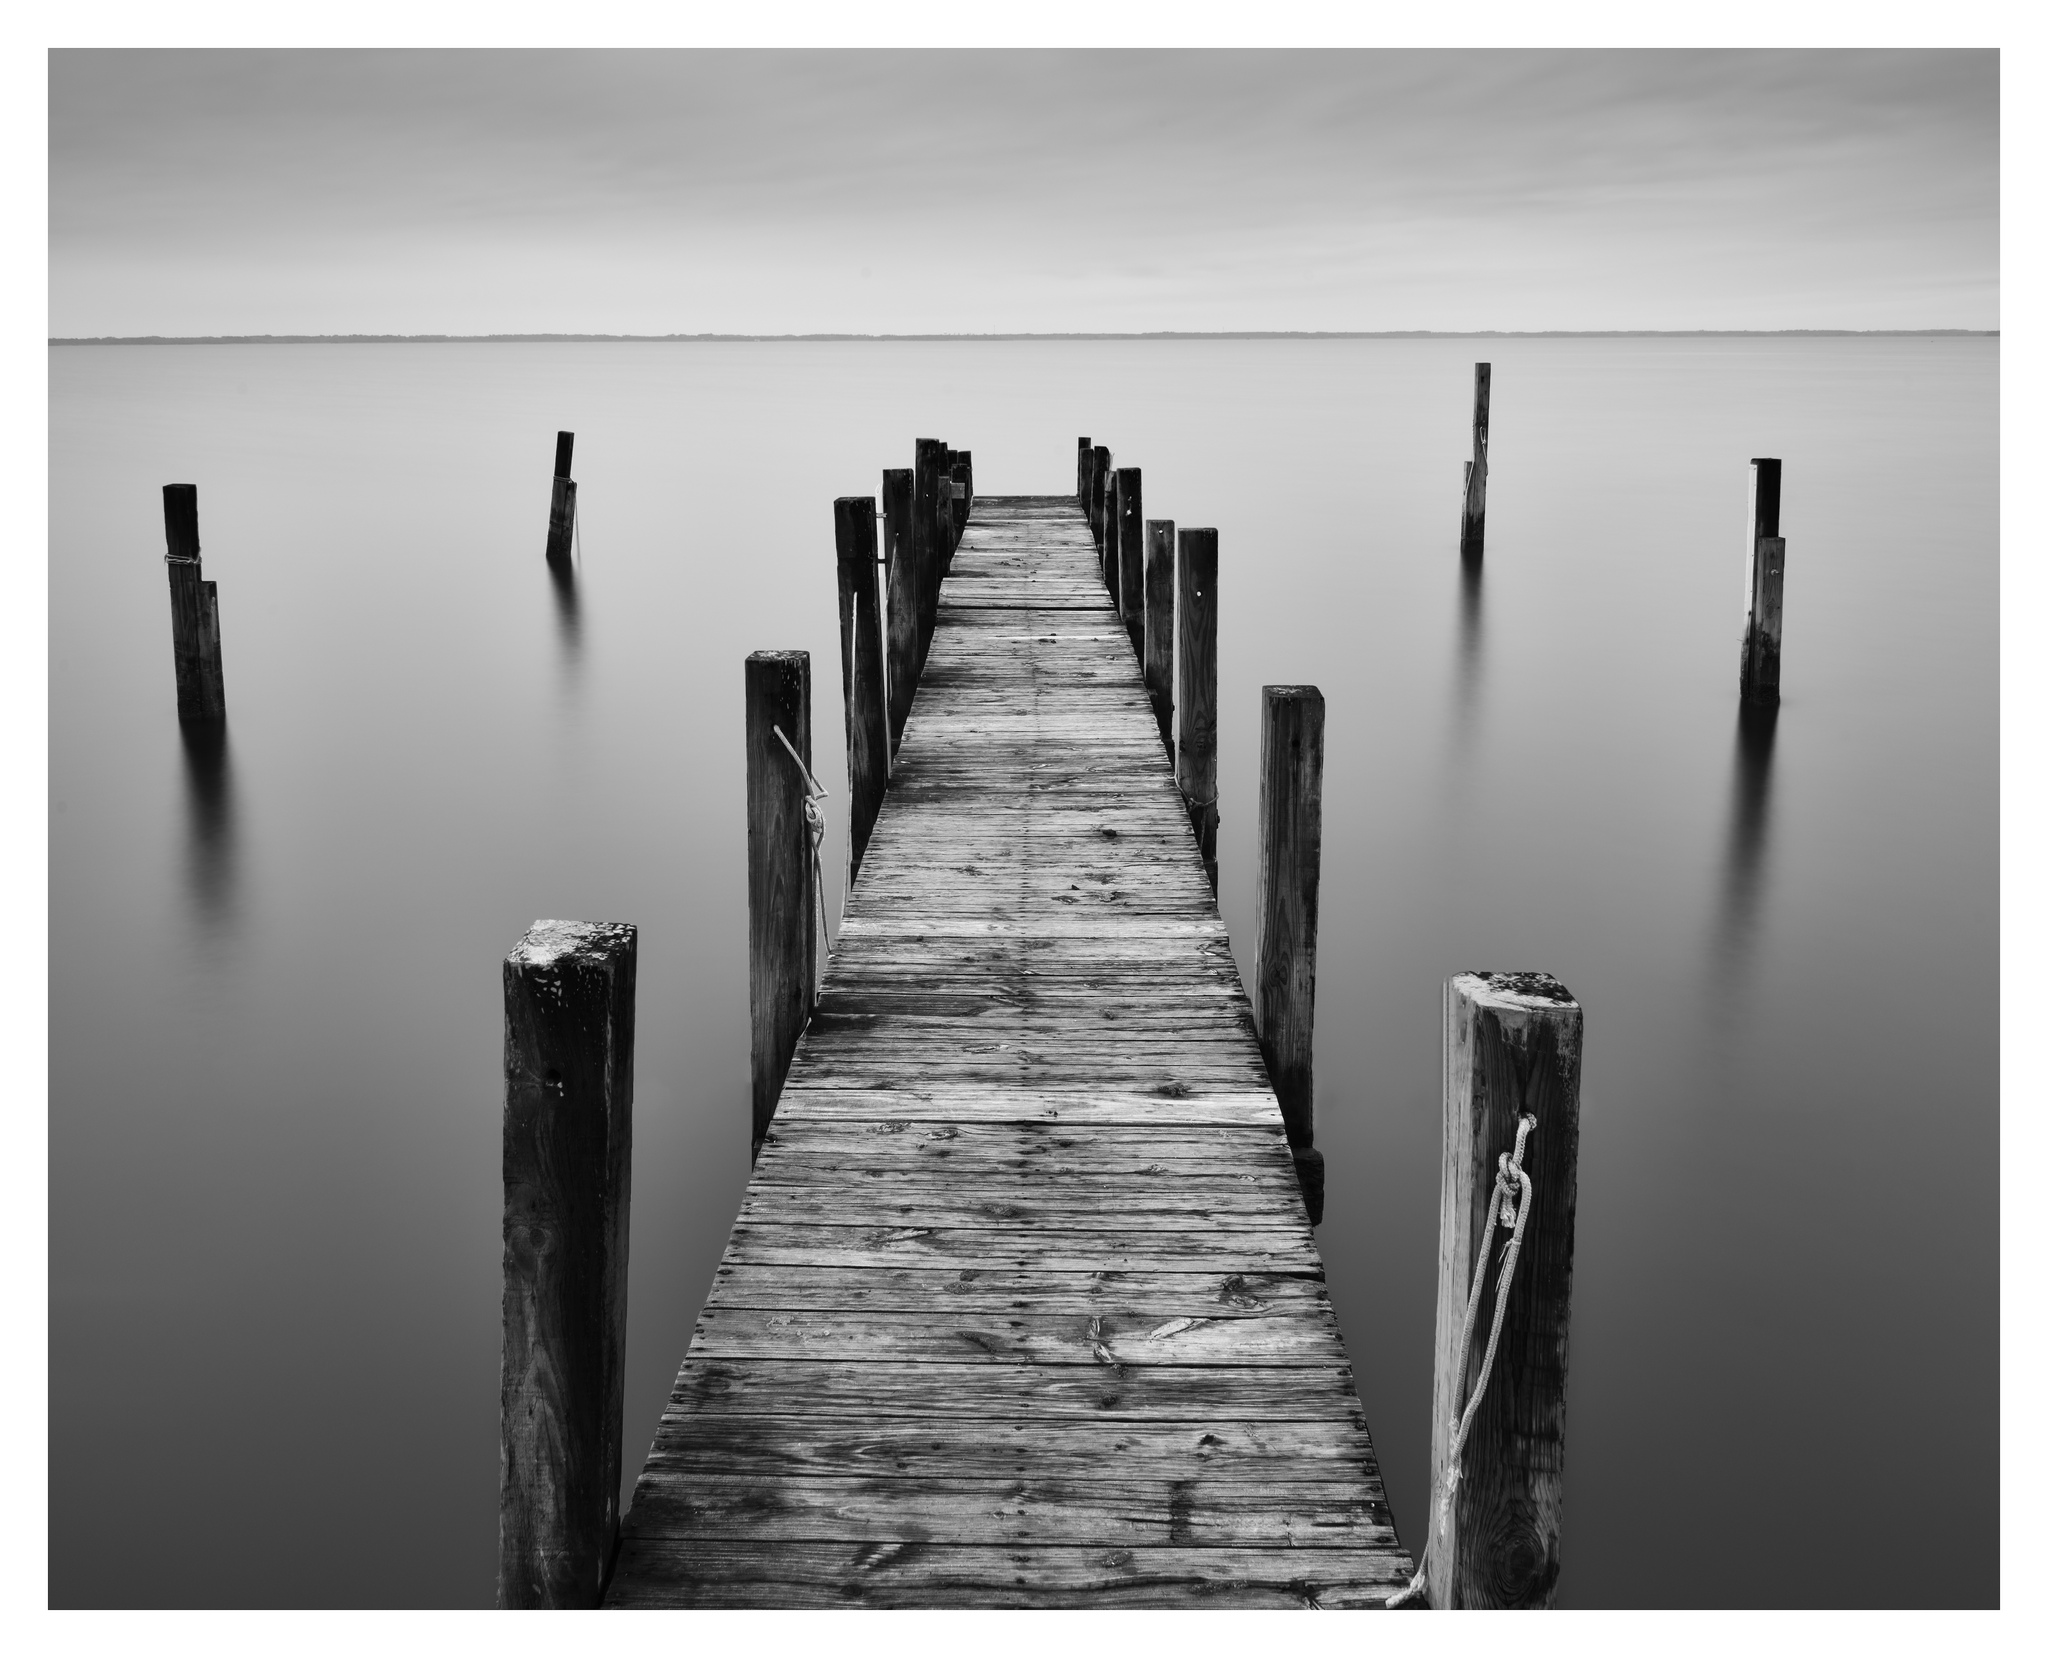 Dock at Duck - Nikon D750 w/24-85mm lens, long exposure